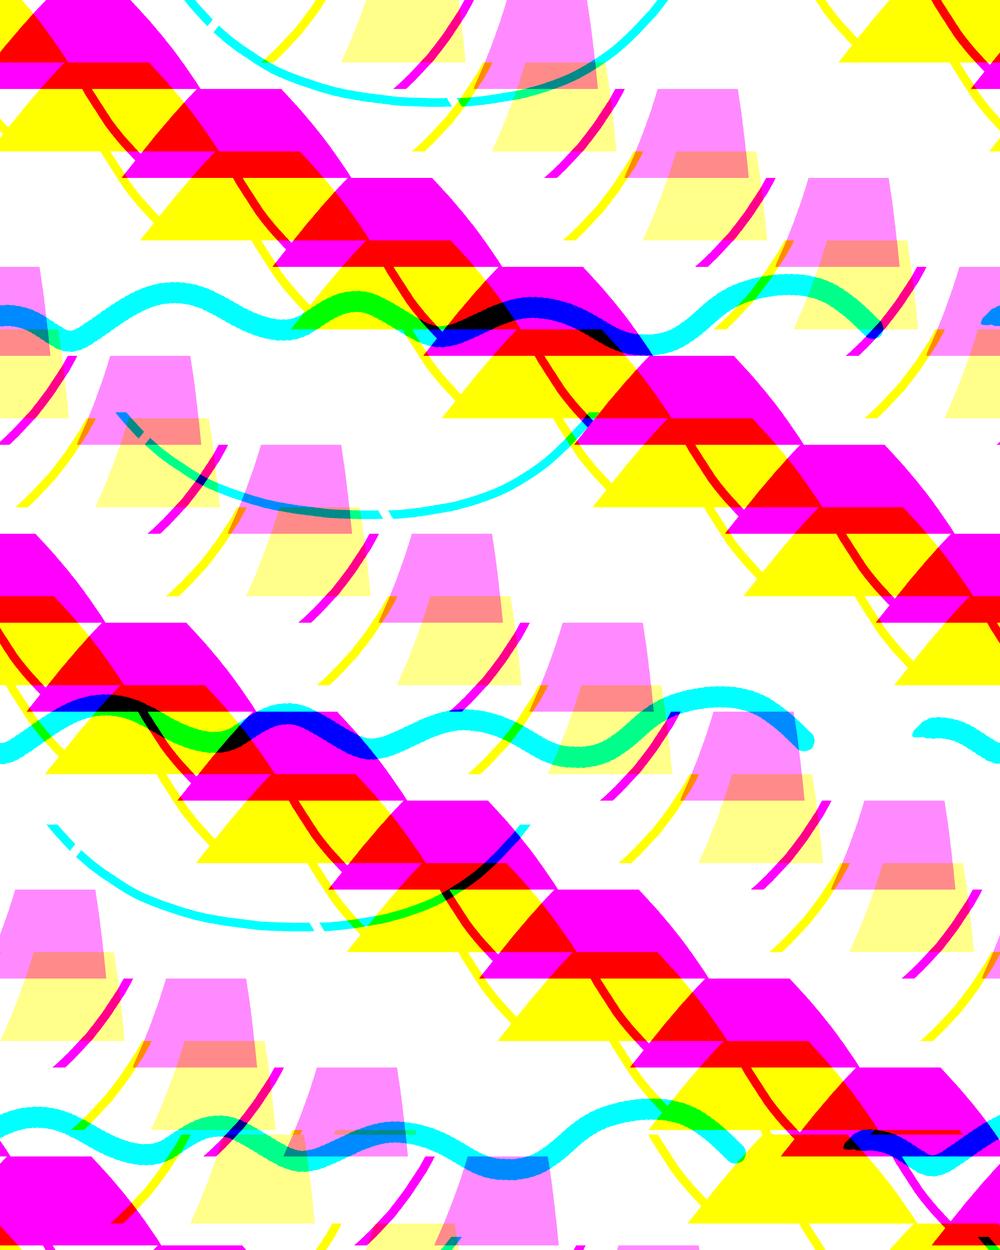 glitch-art-pattern_vibrant-colors